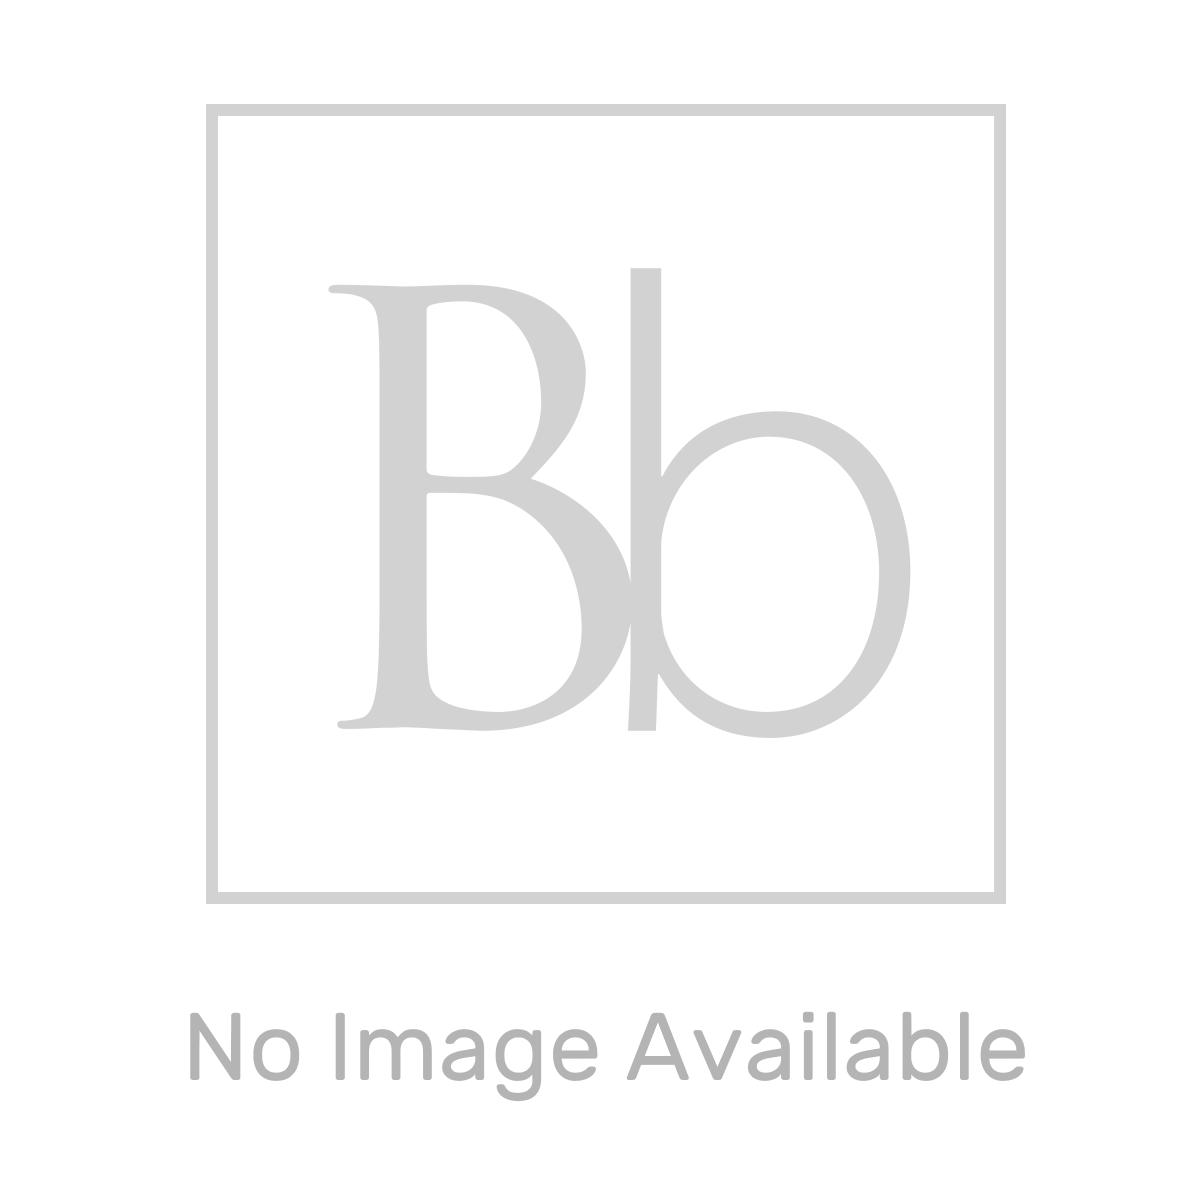 Tavistock Millennium Walnut Wood Veneer Toilet Seat Detail